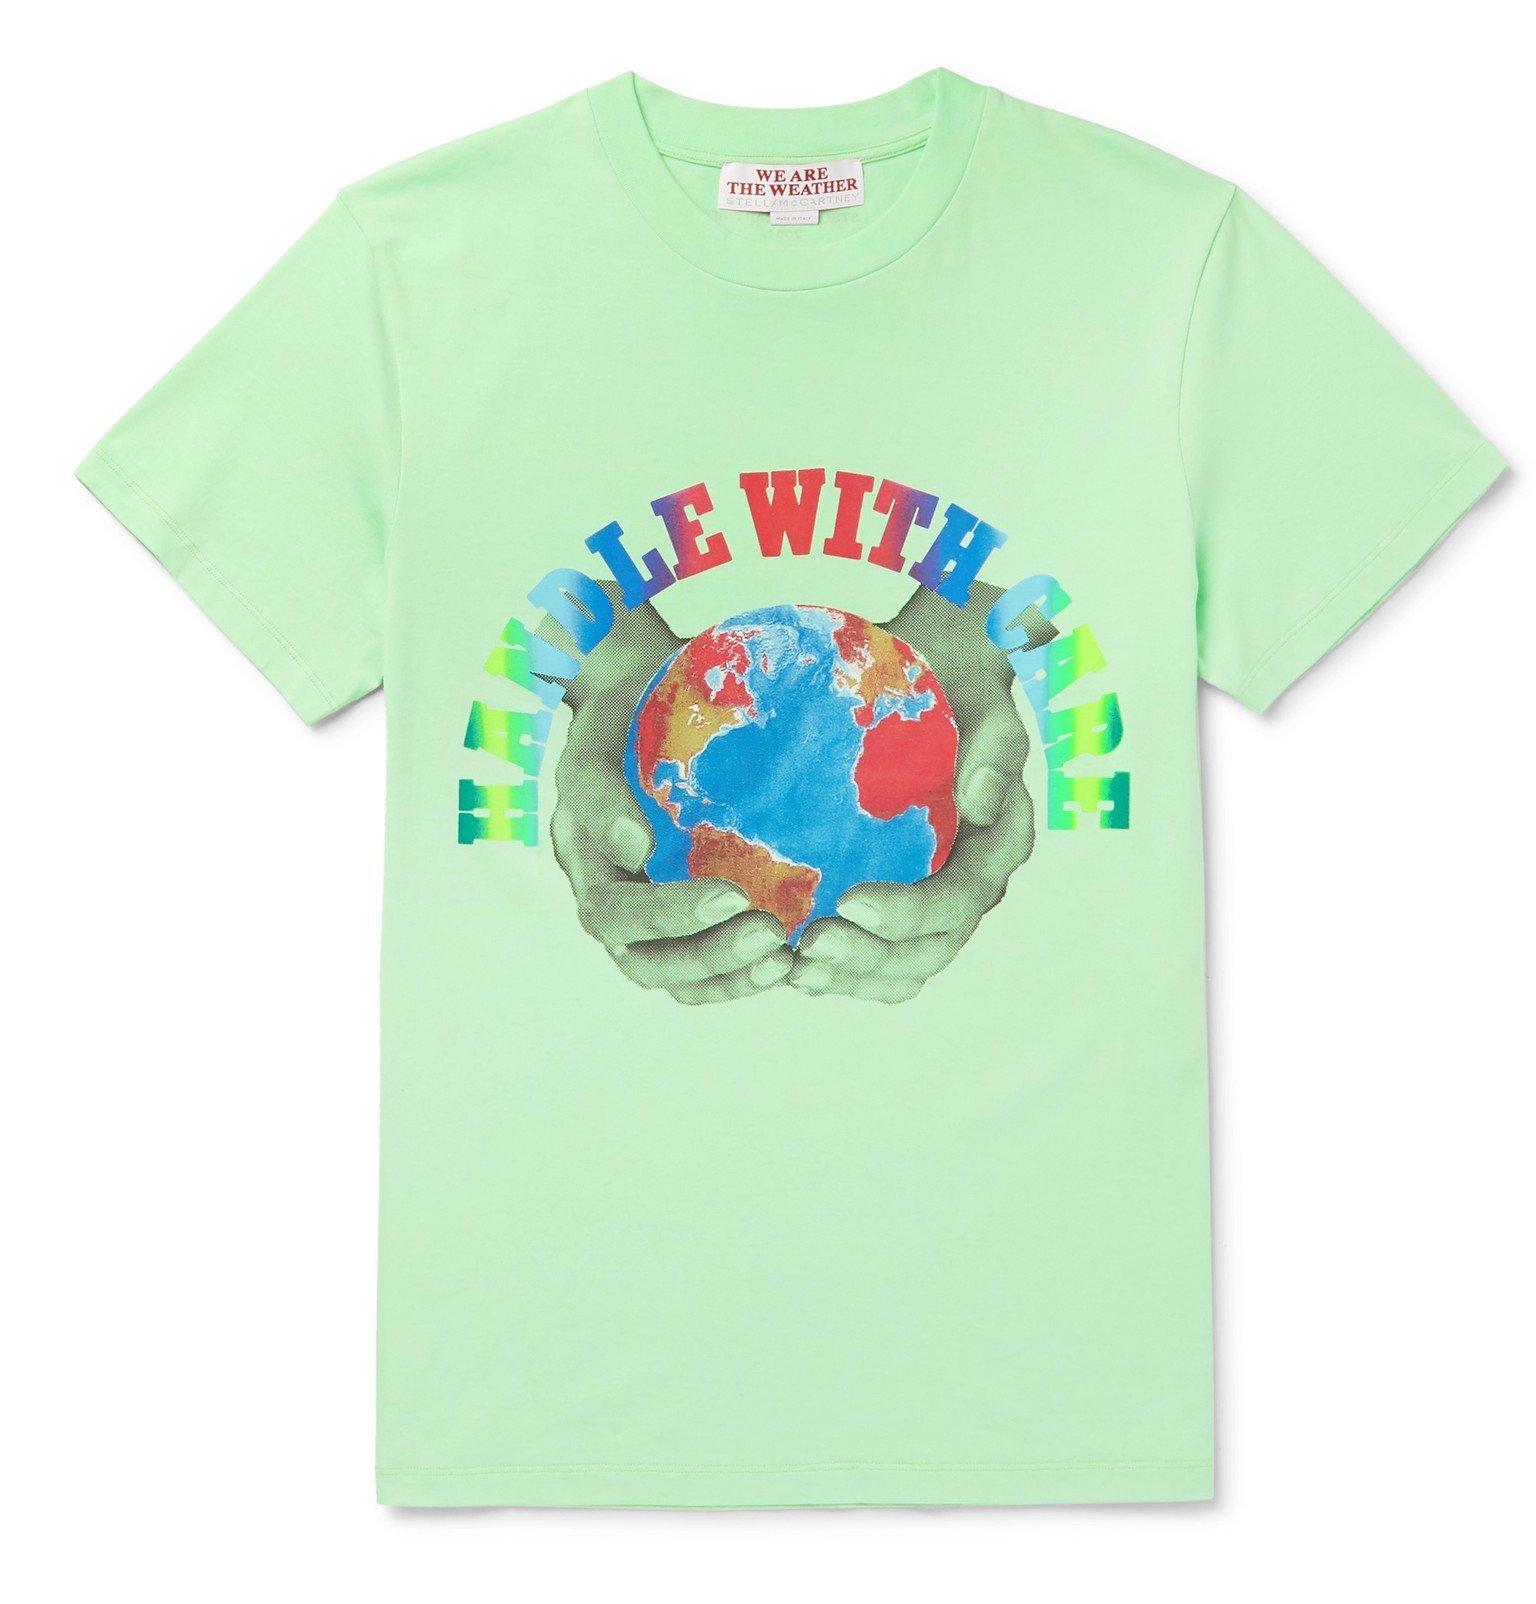 Stella McCartney - Slim-Fit Printed Organic Cotton-Jersey T-Shirt - Green